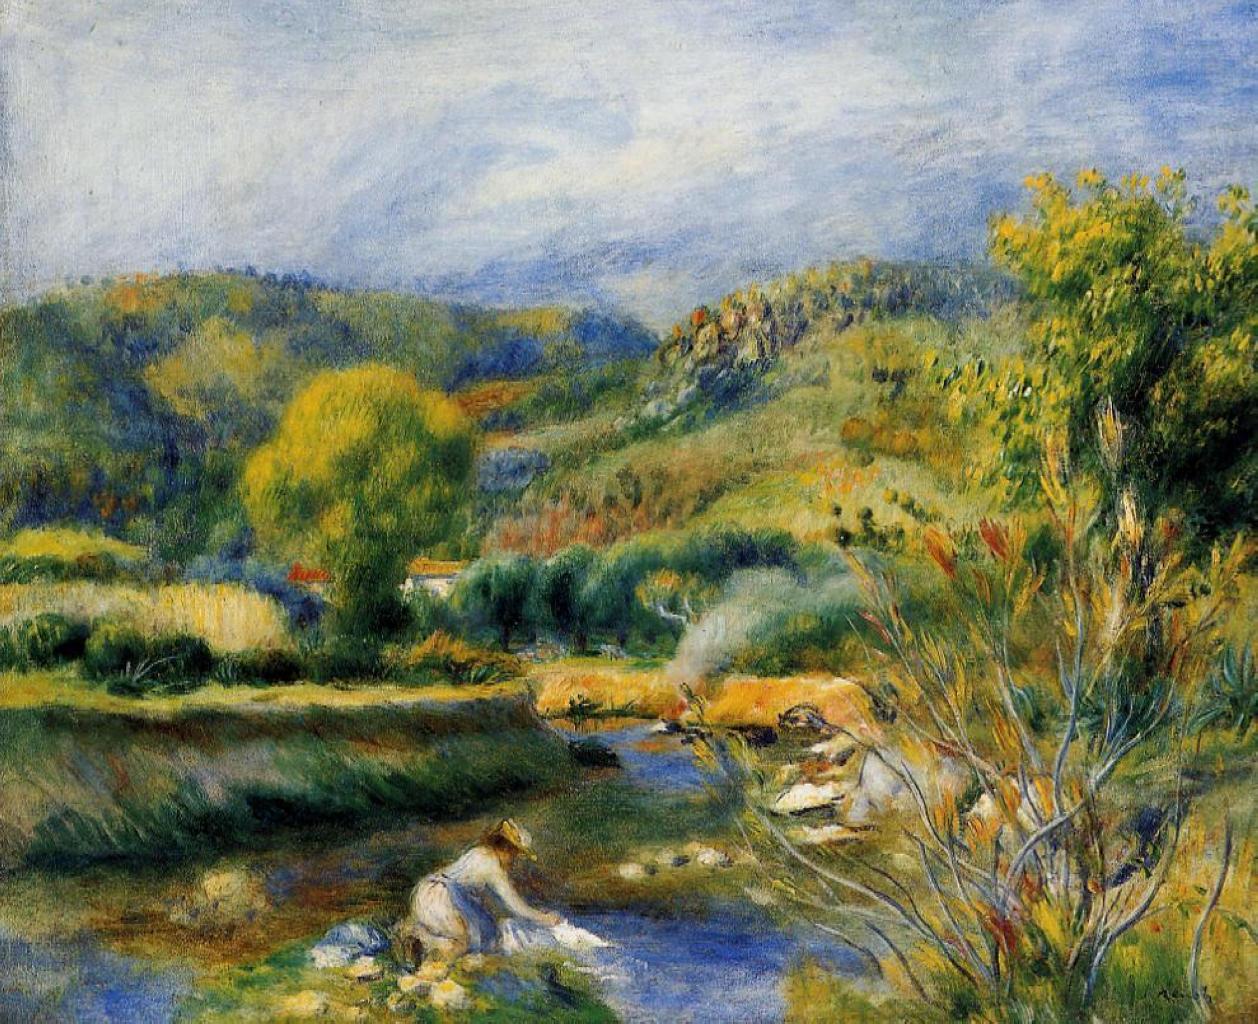 Pierre auguste renoir impressionist painter part 2 for Paintings by renoir